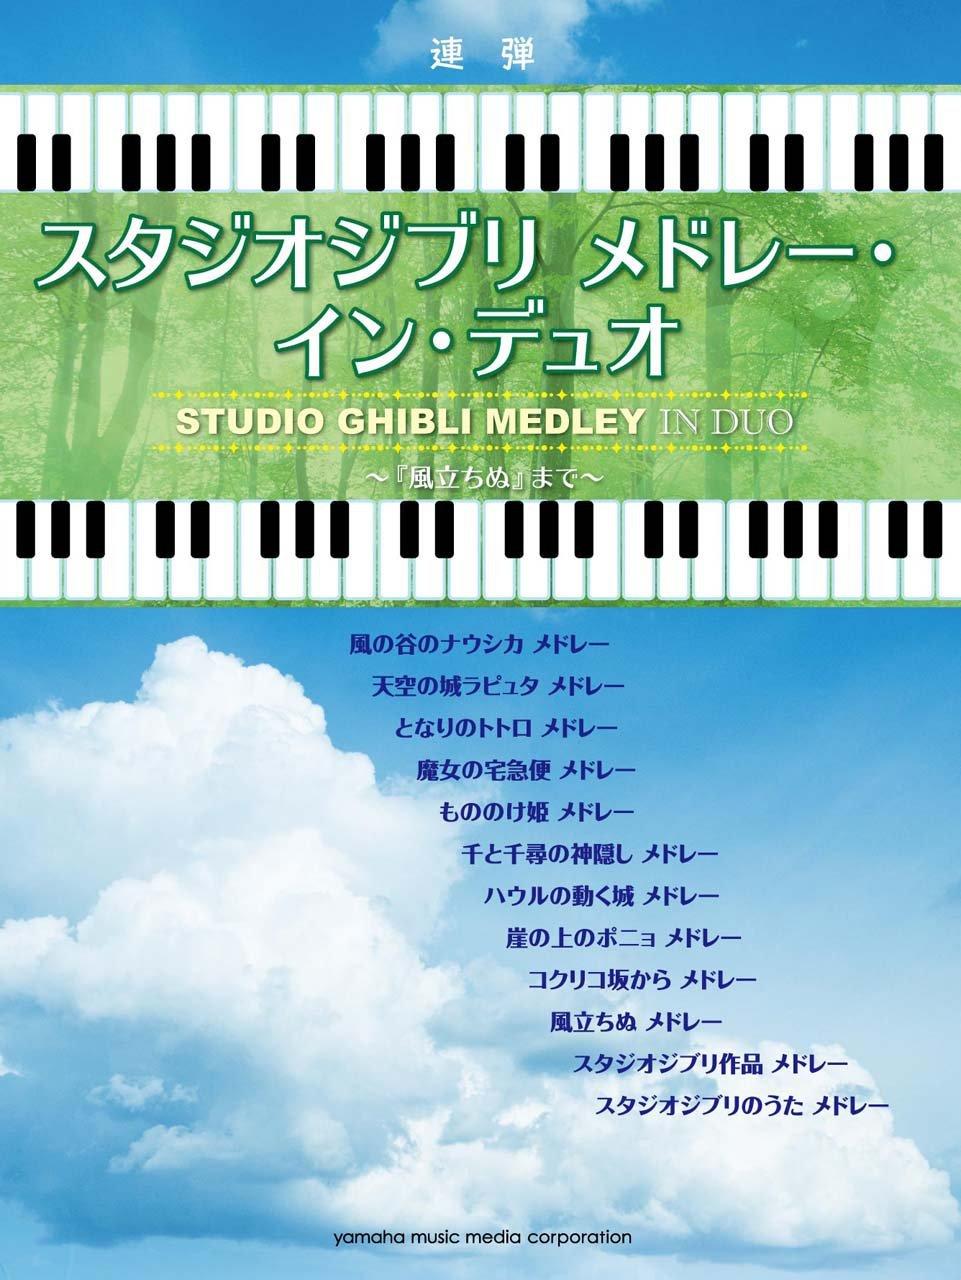 Studio Ghibli Medley For Intermediate to Advanced Piano Duet Sheet Music Book